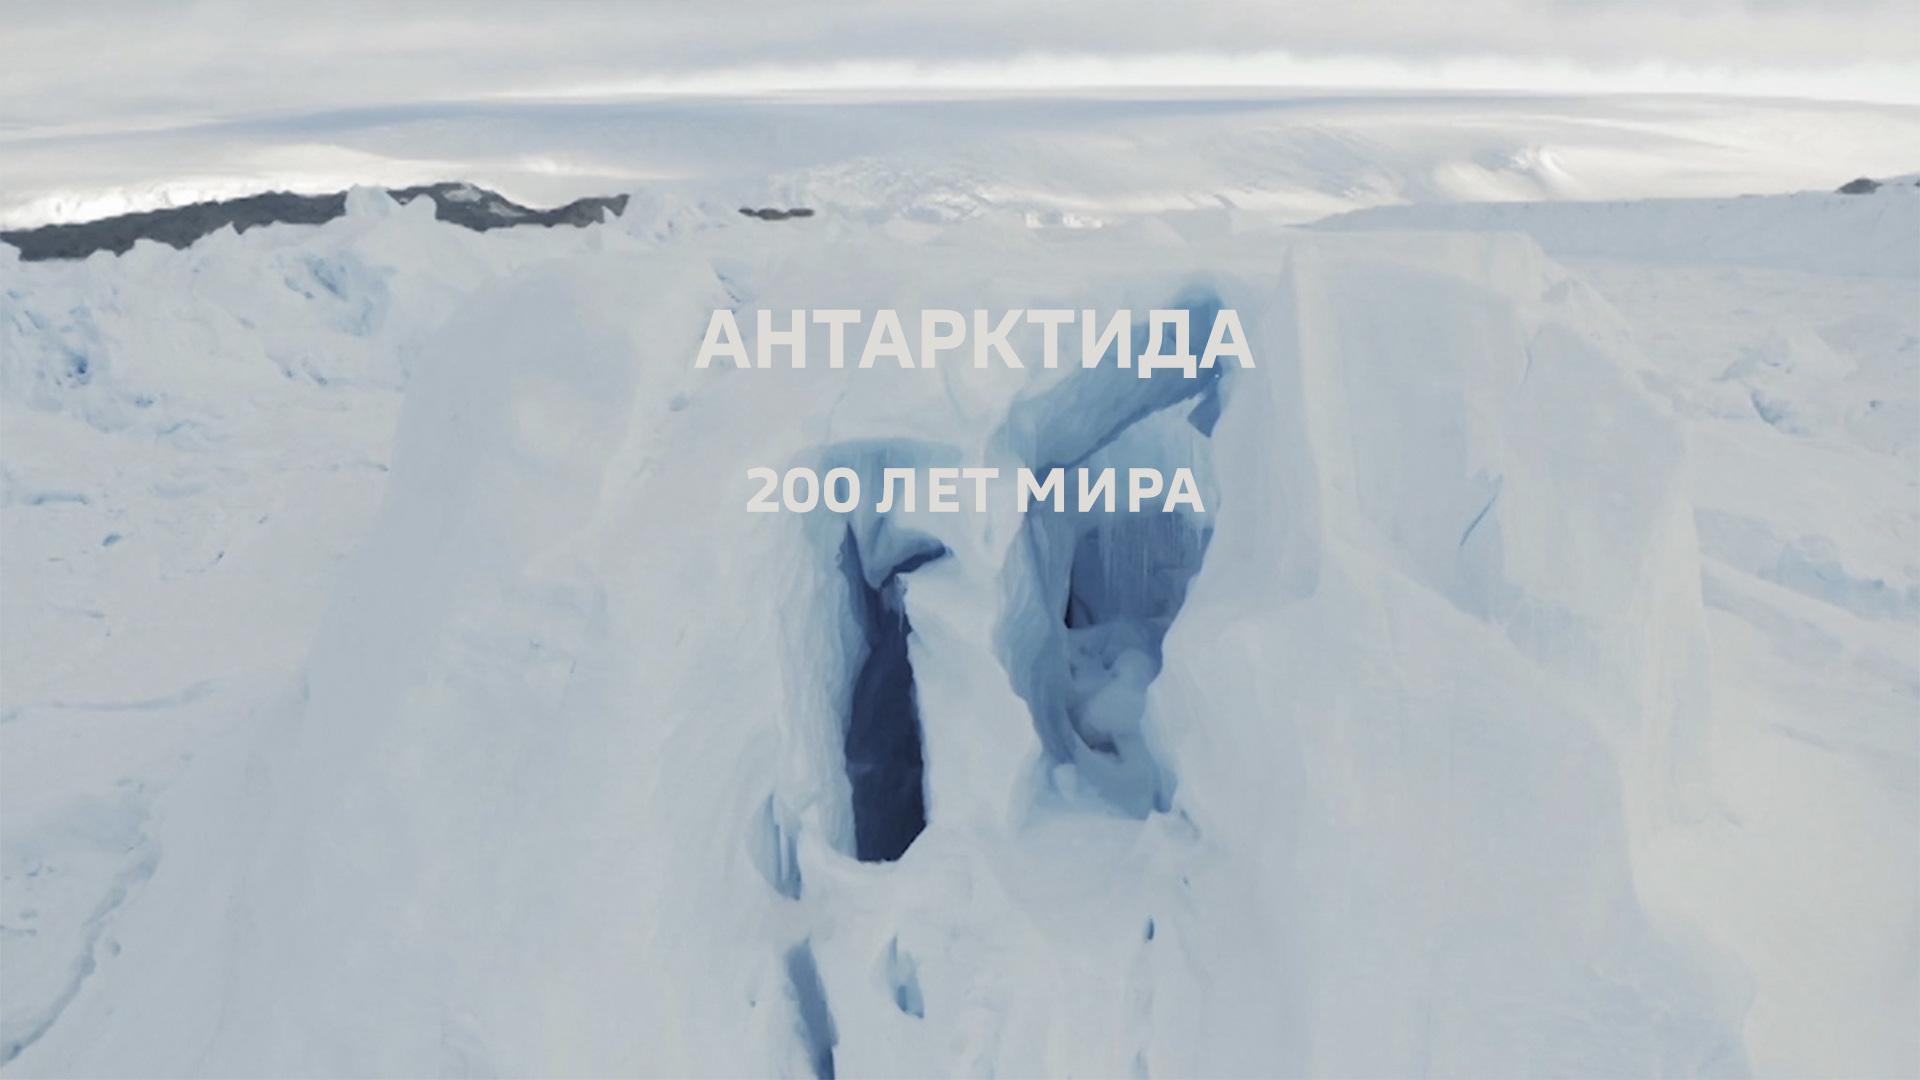 Антарктида. 200 лет мира